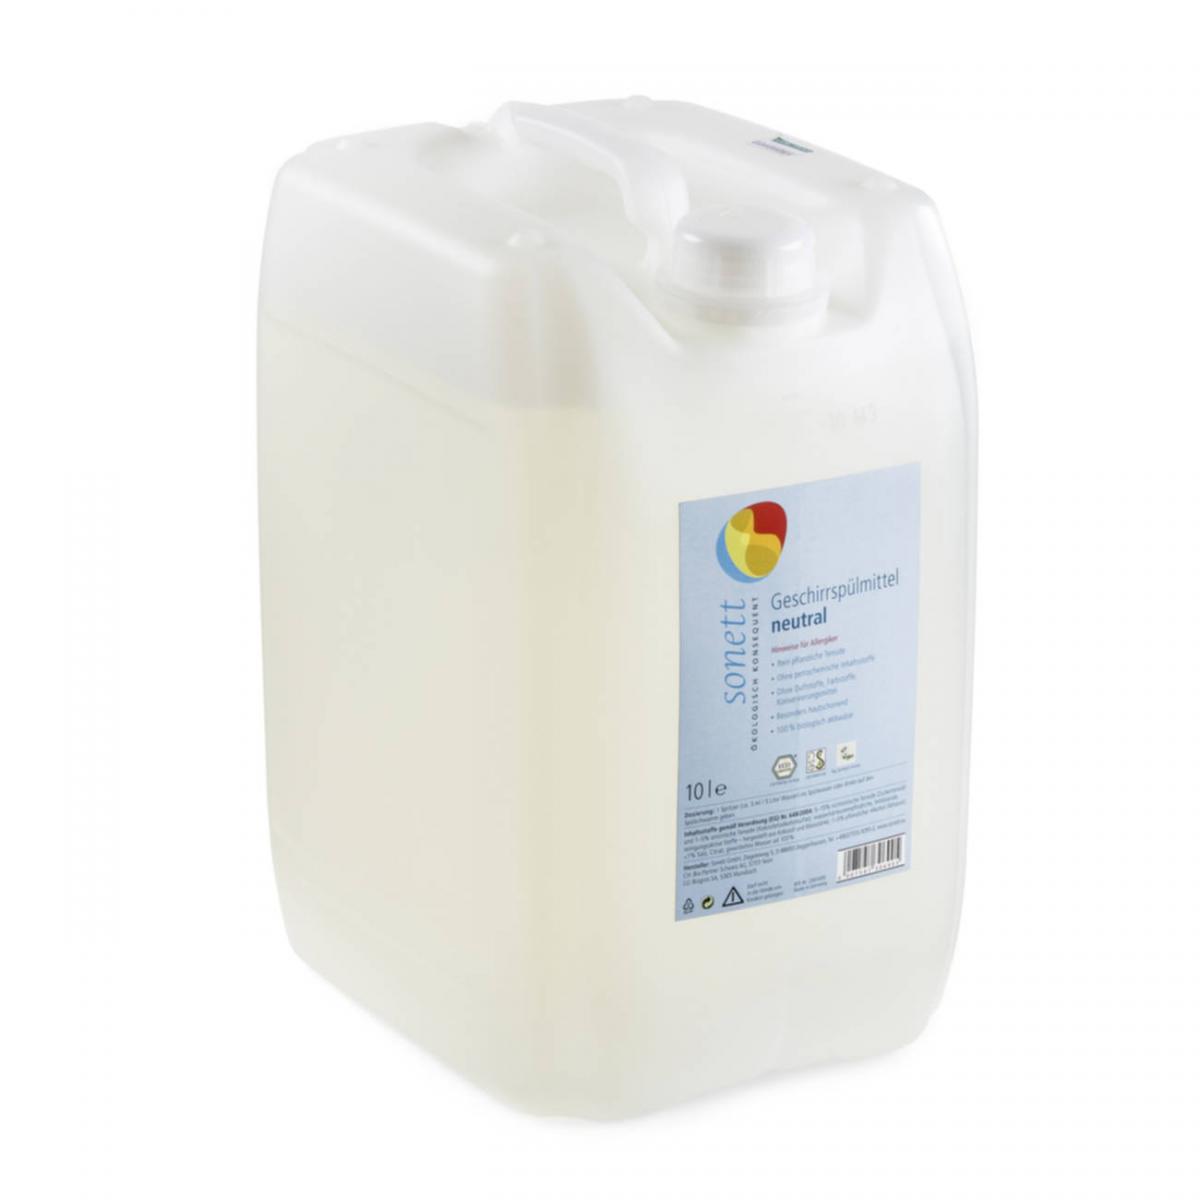 Geschirrspülmittel sensitiv, ohne Duftstoffe Bidon 10 l - Sonett